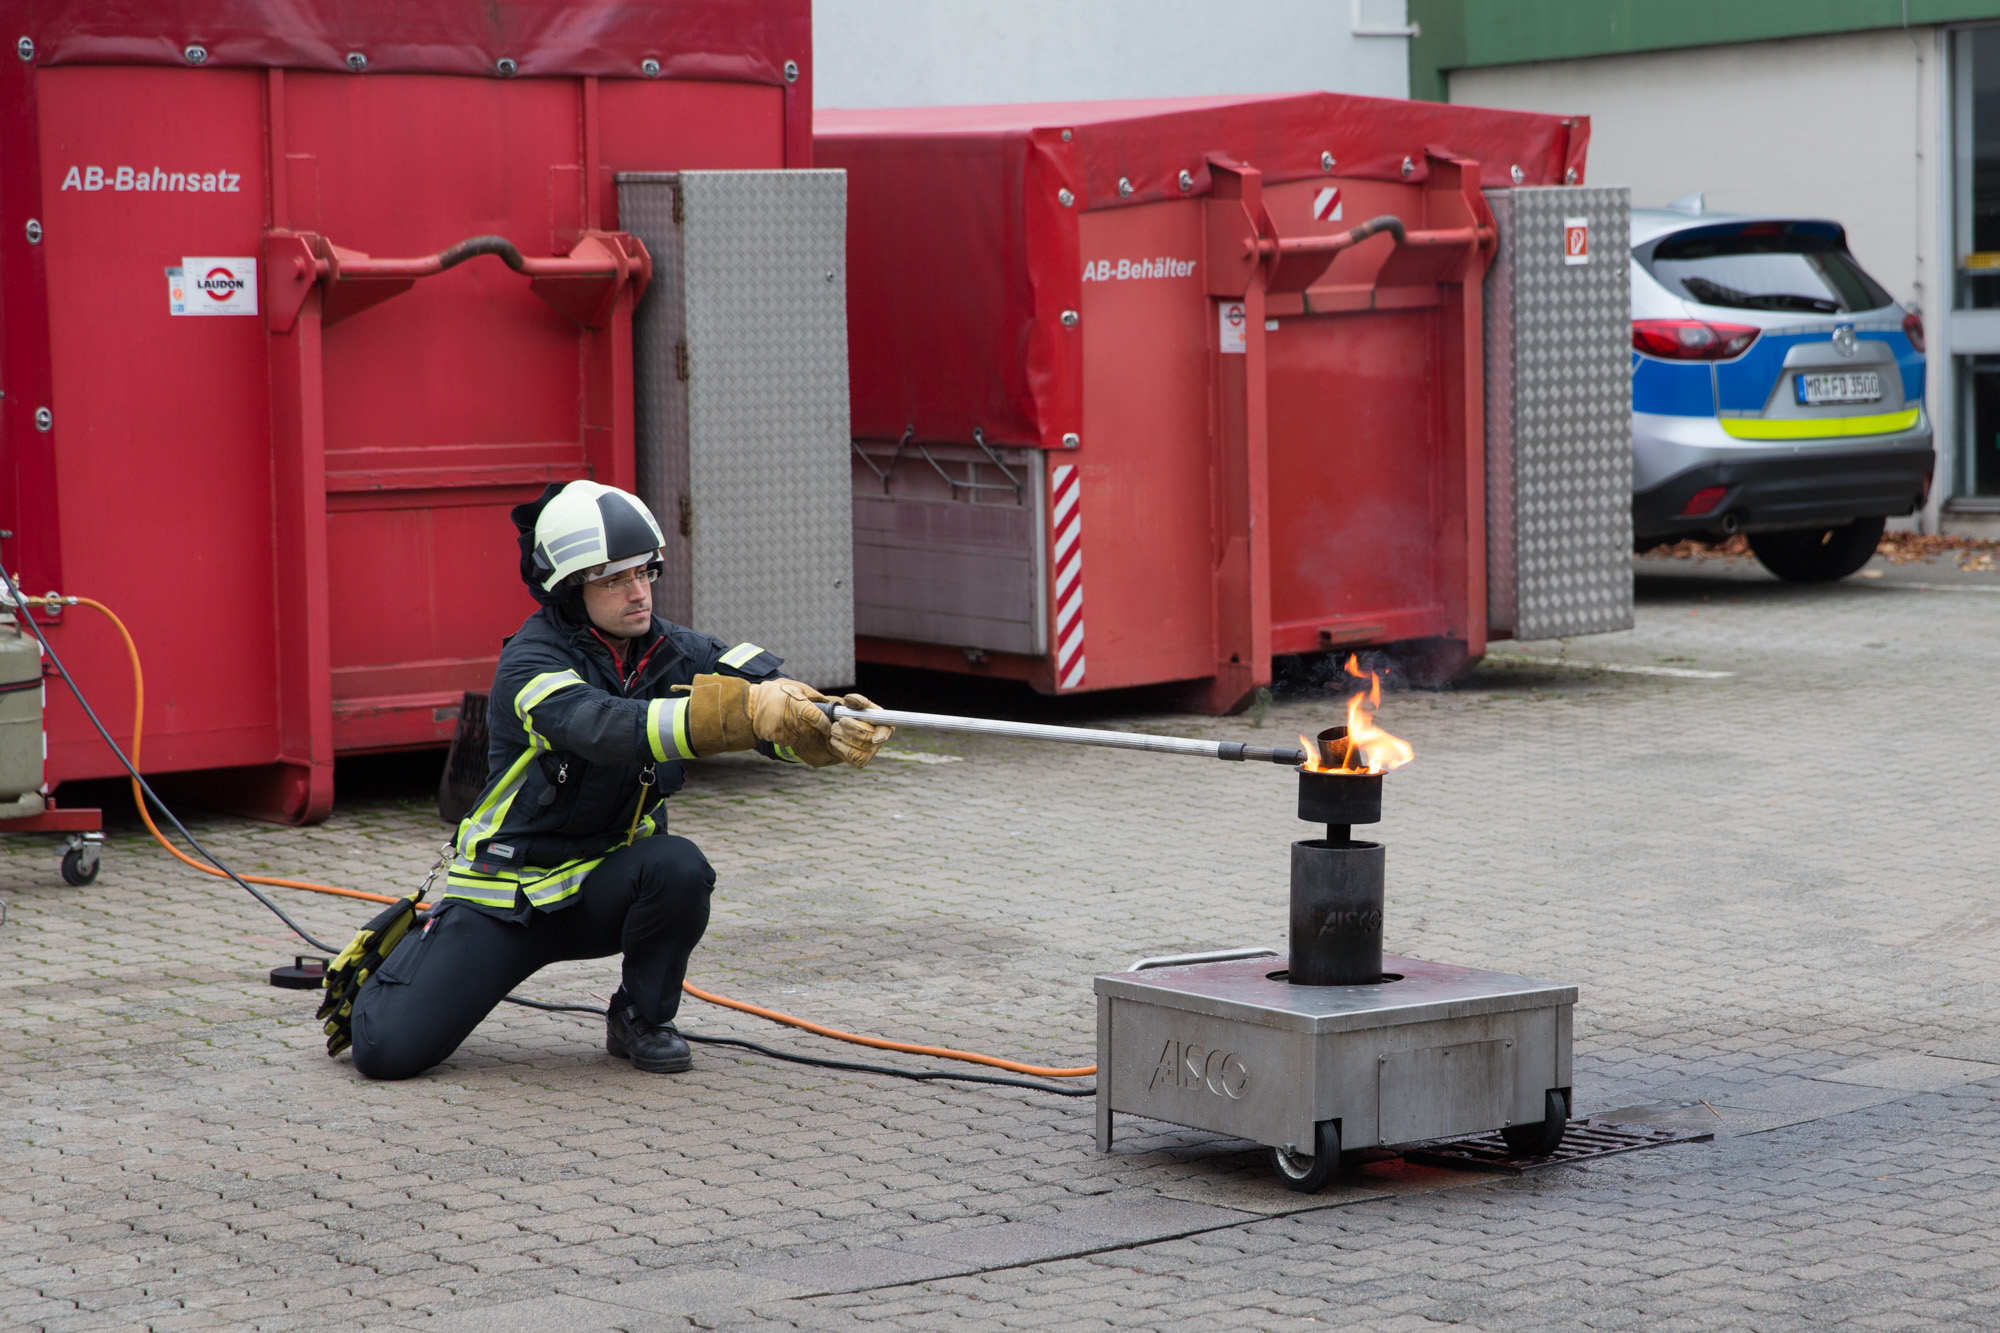 Wasser wird in brennendes Fett geschüttet